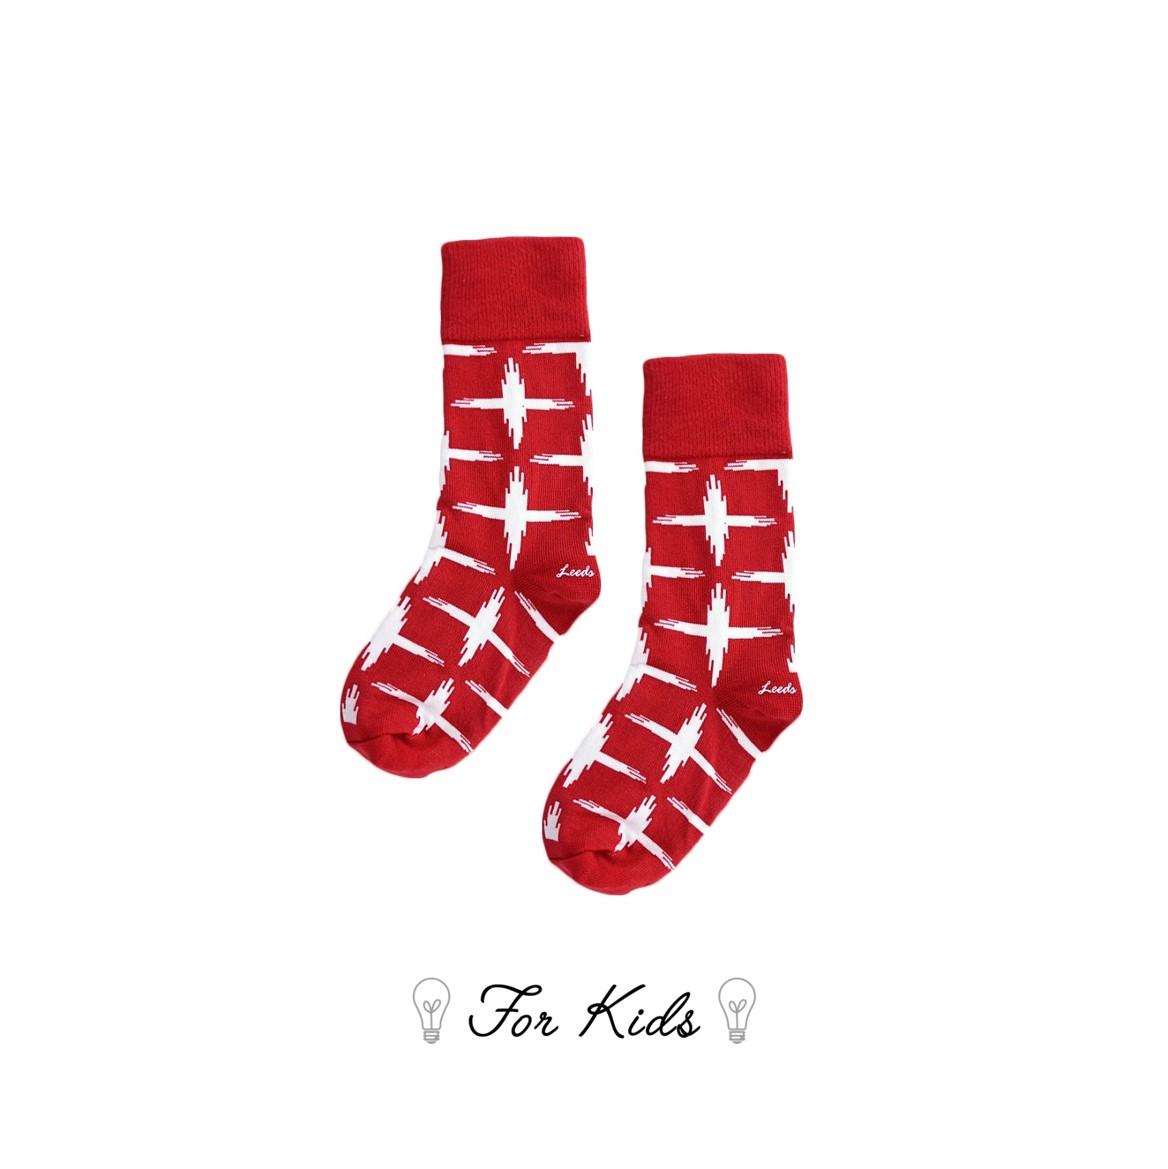 Leeds weather【英國設計】天然純棉孩童襪子★城市漫遊十字襪子【Cotton Socks Recommendations】- Tramway ( Vice Versa 系列共8款) 皇室孩童御用推薦、可愛輕鬆穿、透氣舒適耐穿好搭配